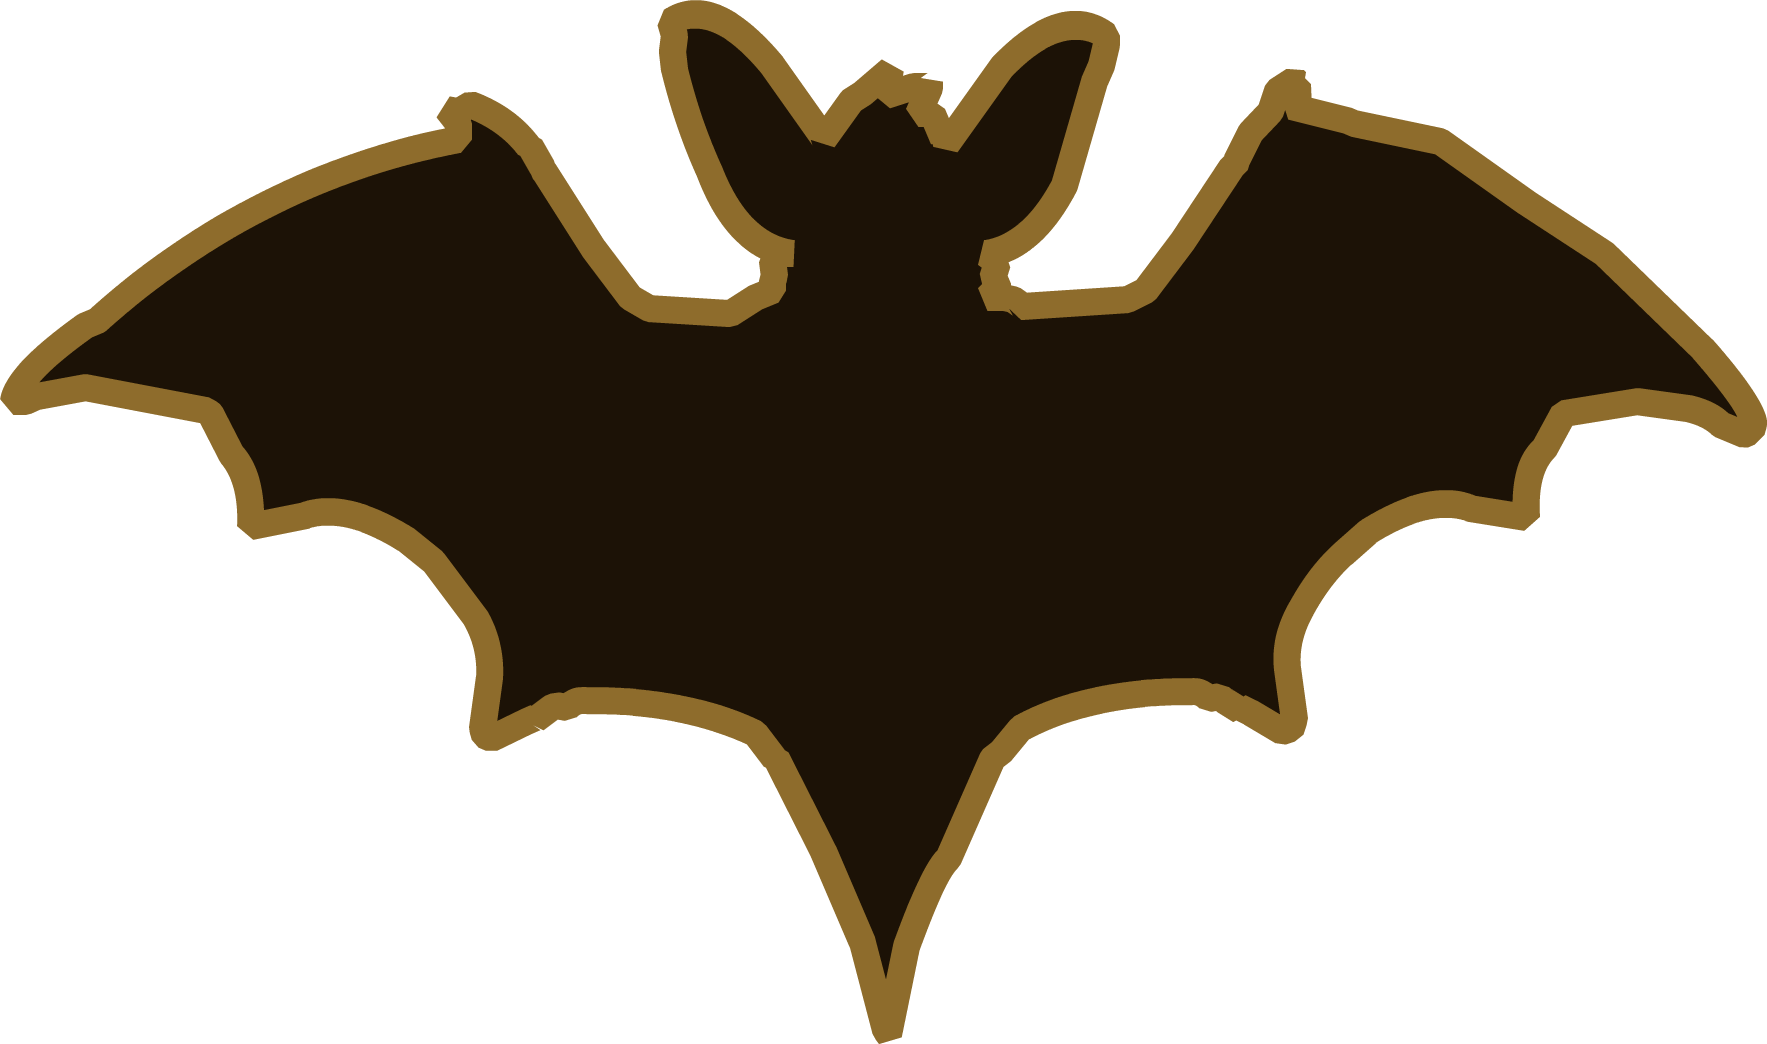 Image Halloween 2013 Emoticons Bat Png Club Penguin